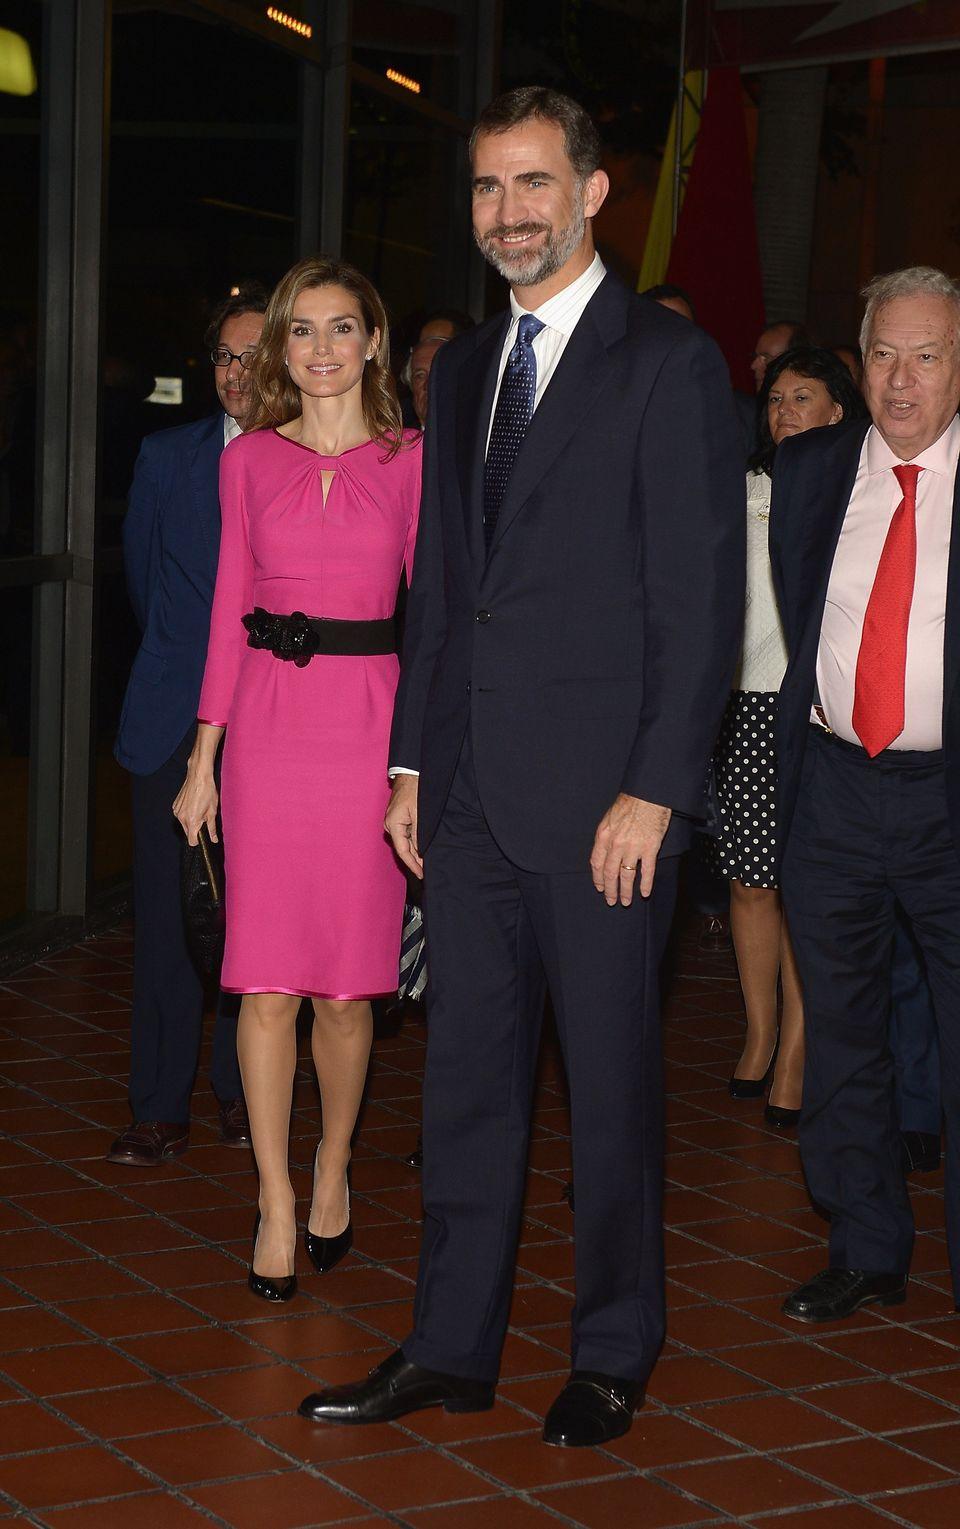 MIAMI, FL - NOVEMBER 17:  Prince Felipe of Spain (R) and Princess Letizia  attends the Miami Book Fair International 2013 Ina